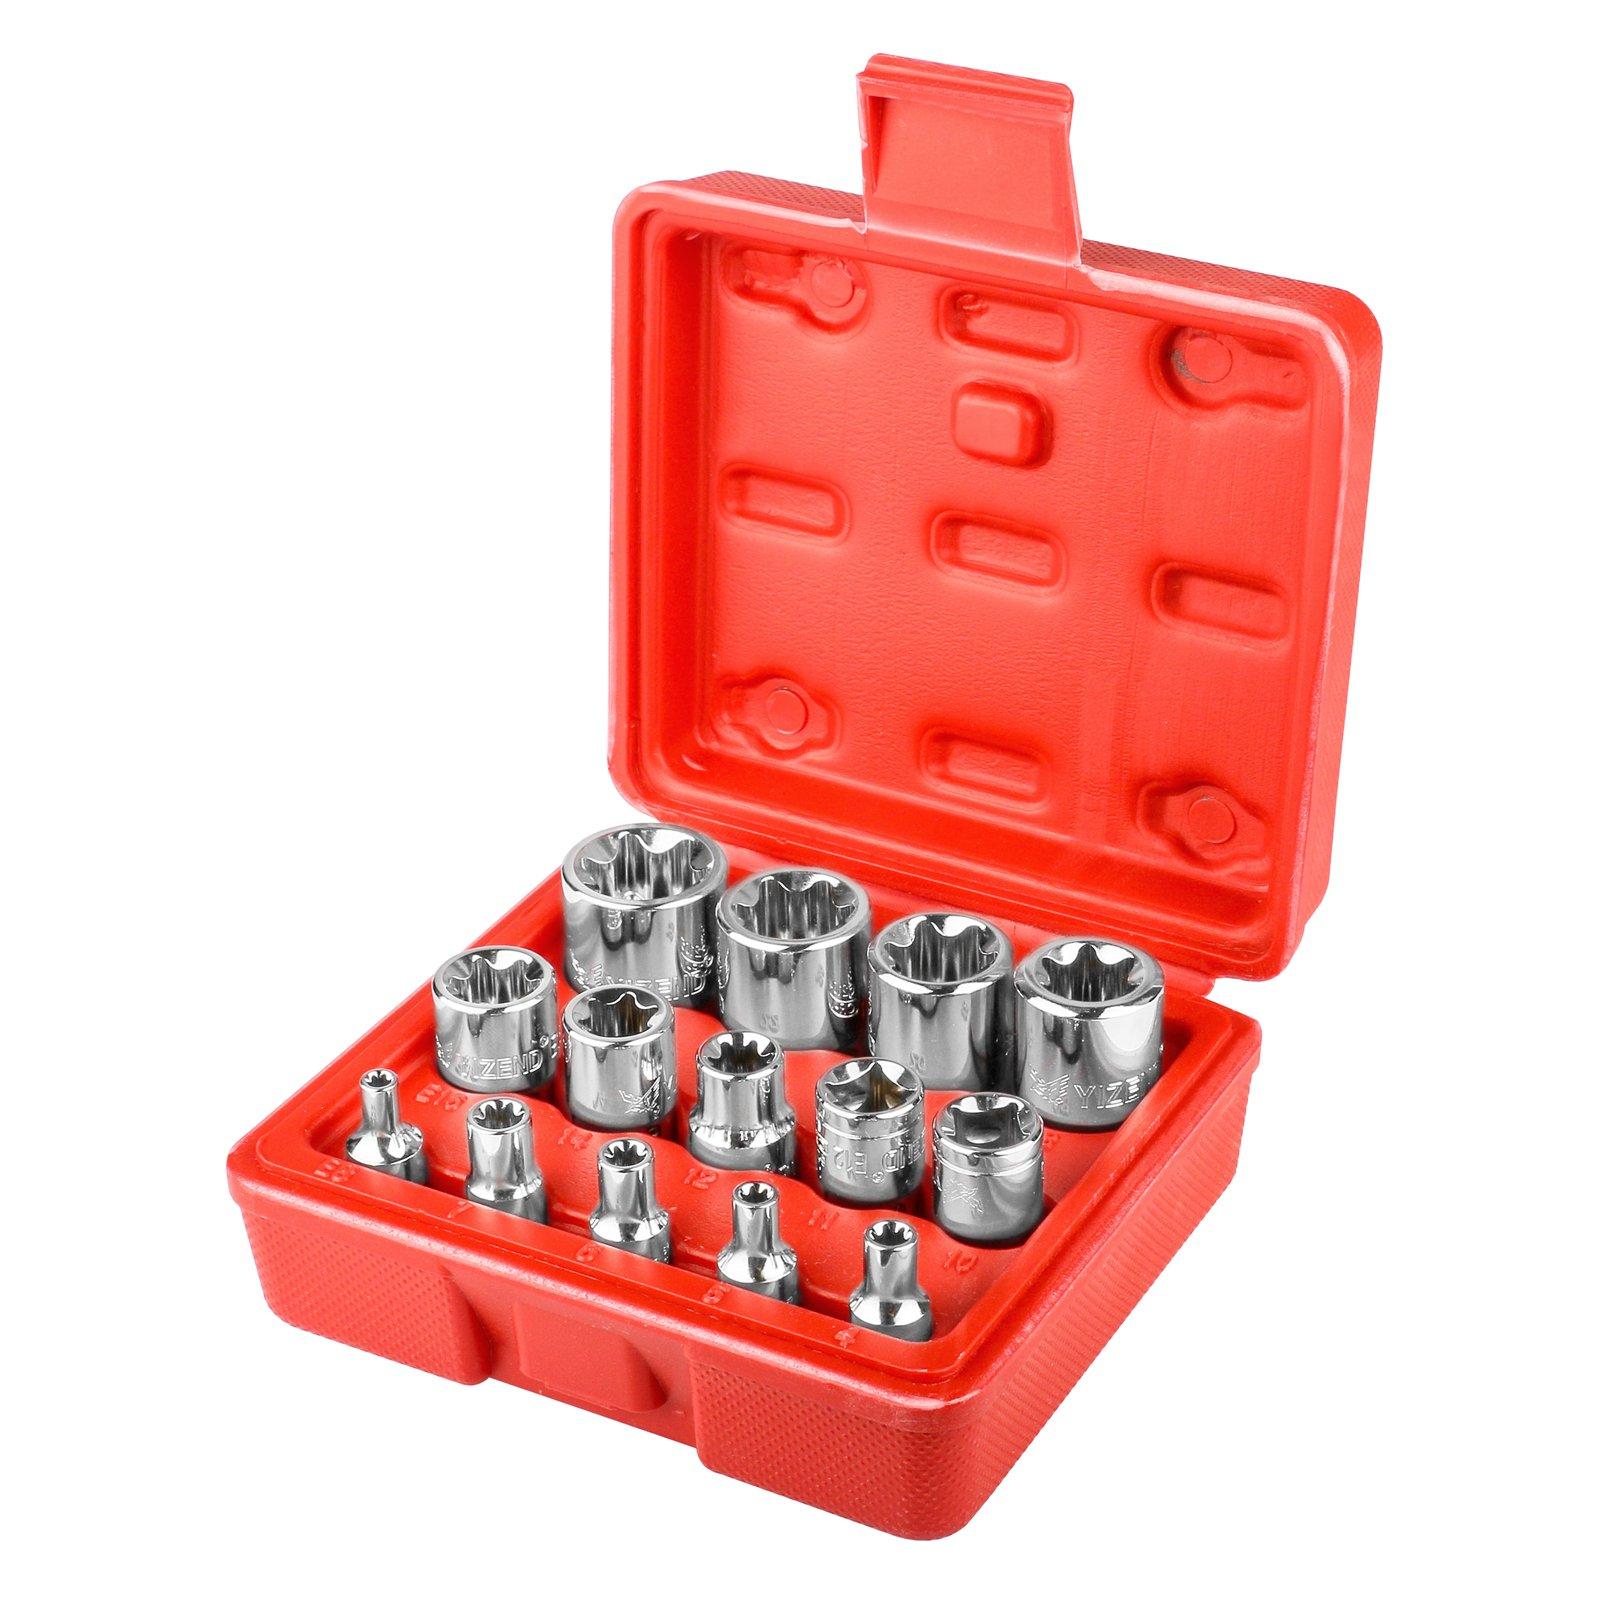 14 PCS Female Torx Bit Star-Shaped Socket Set 1/4, 3/8, 1/2 inch drive E4 - E24(4MM-24MM) Car Repair Tool